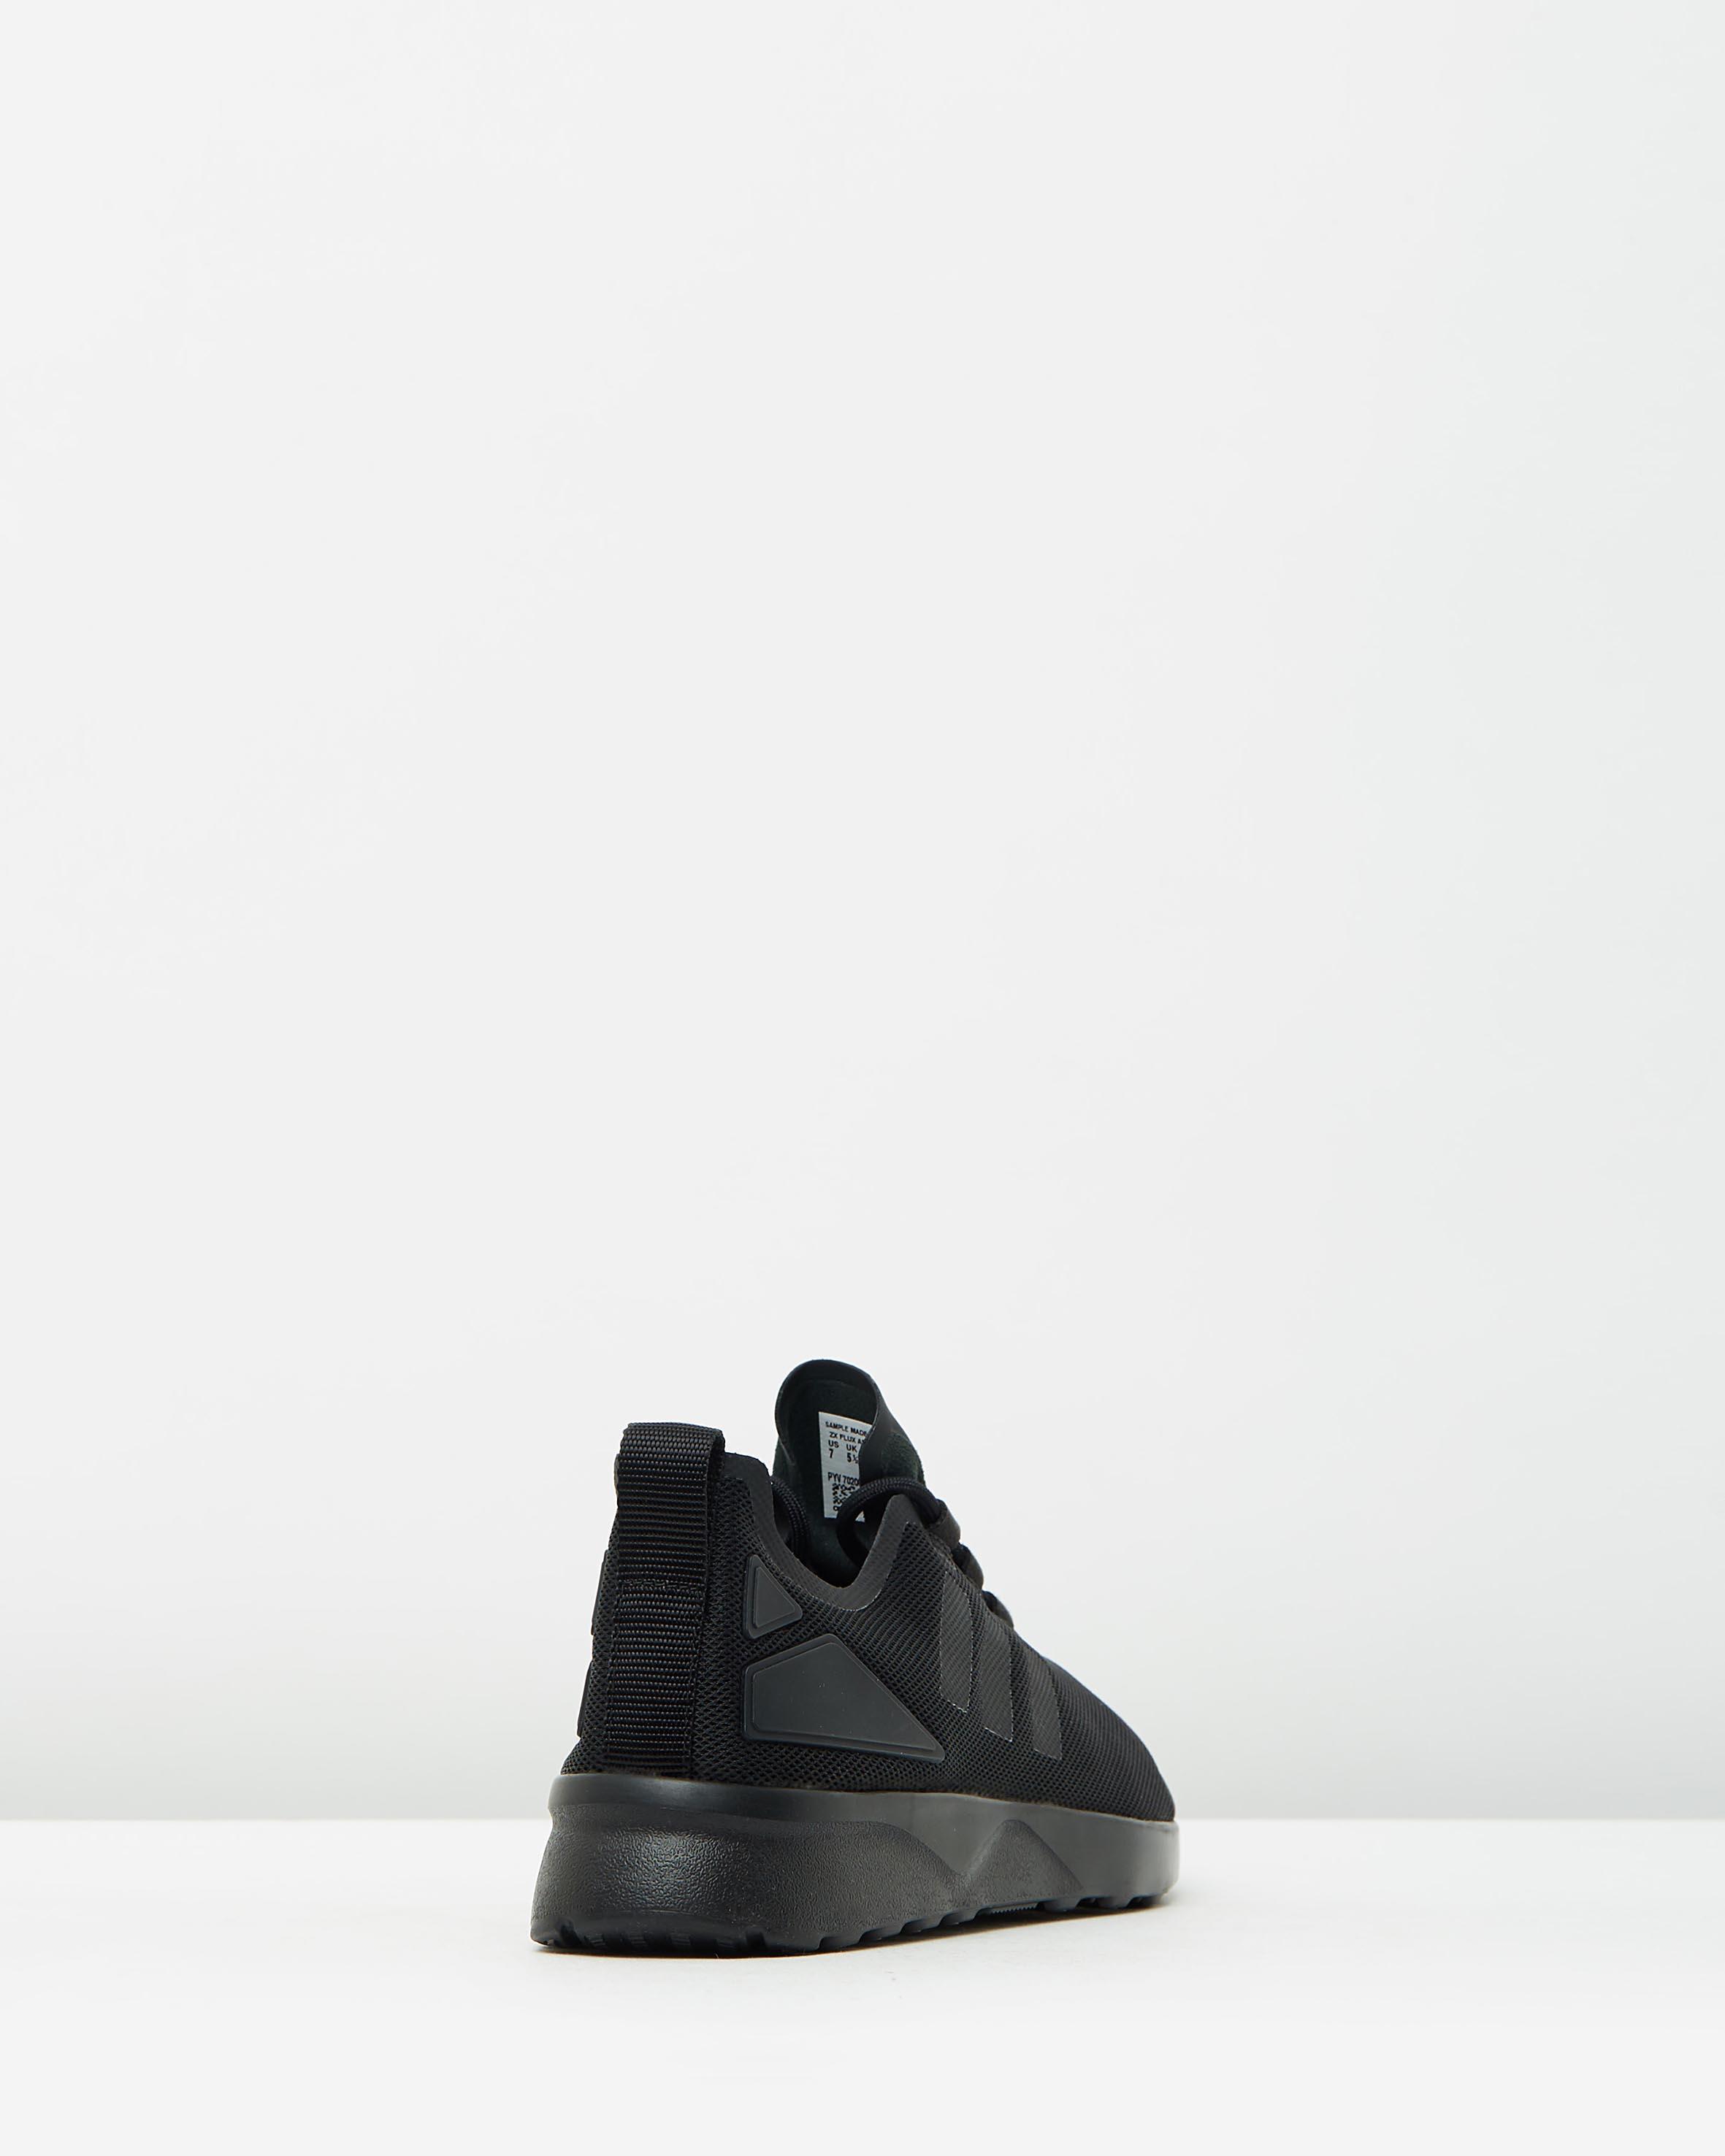 6088e8e31 ... Adidas Womens ZX Flux Adv Verve W Black 2 ...